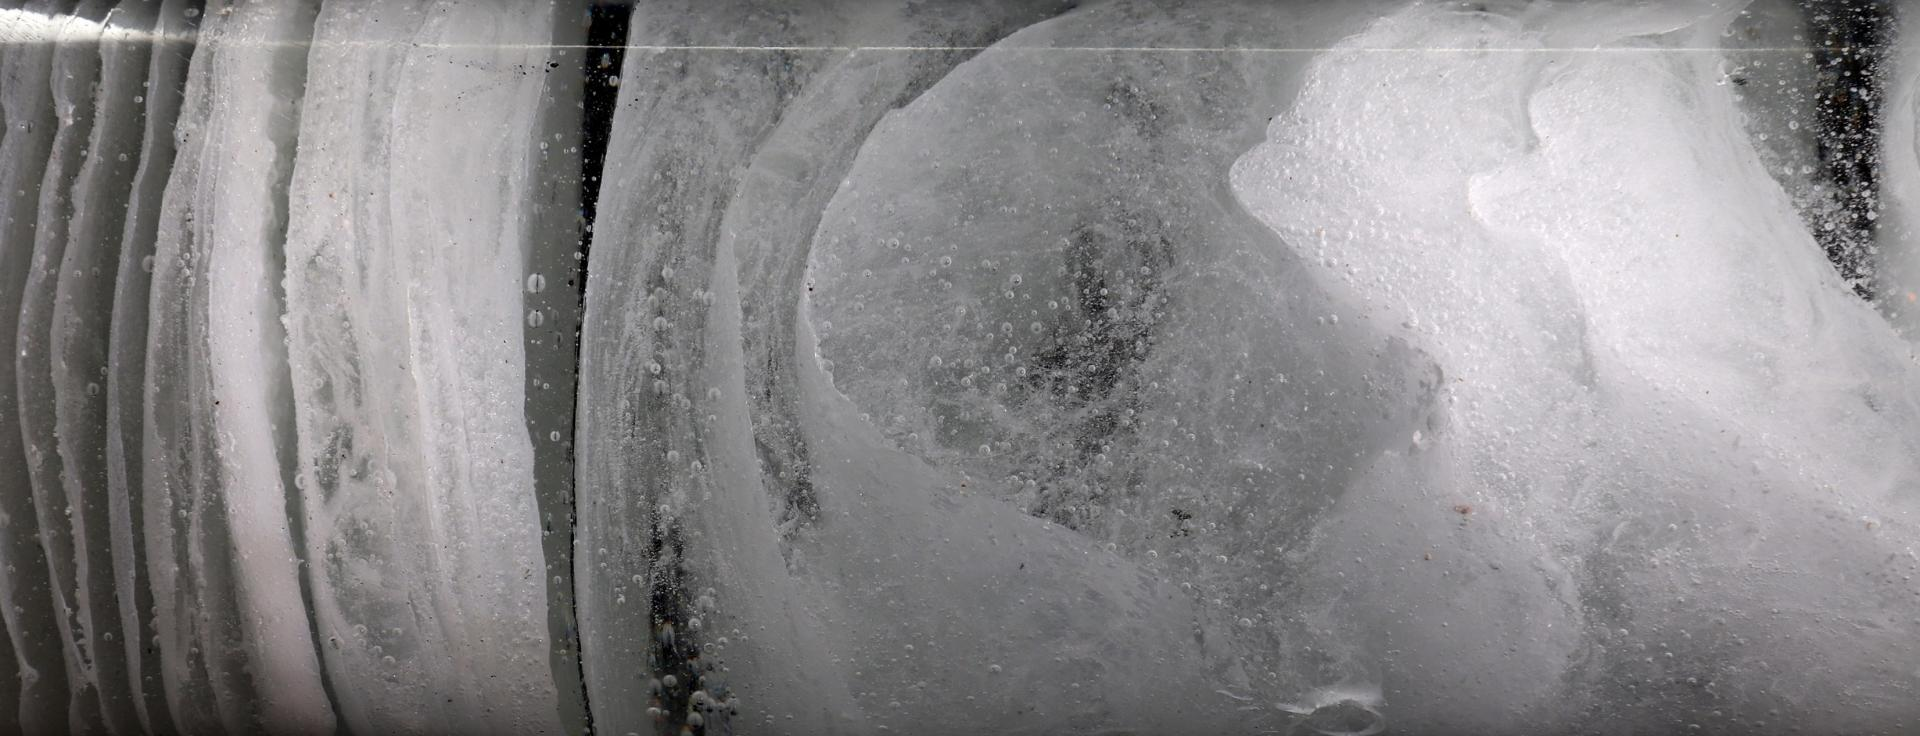 Carotte de glace